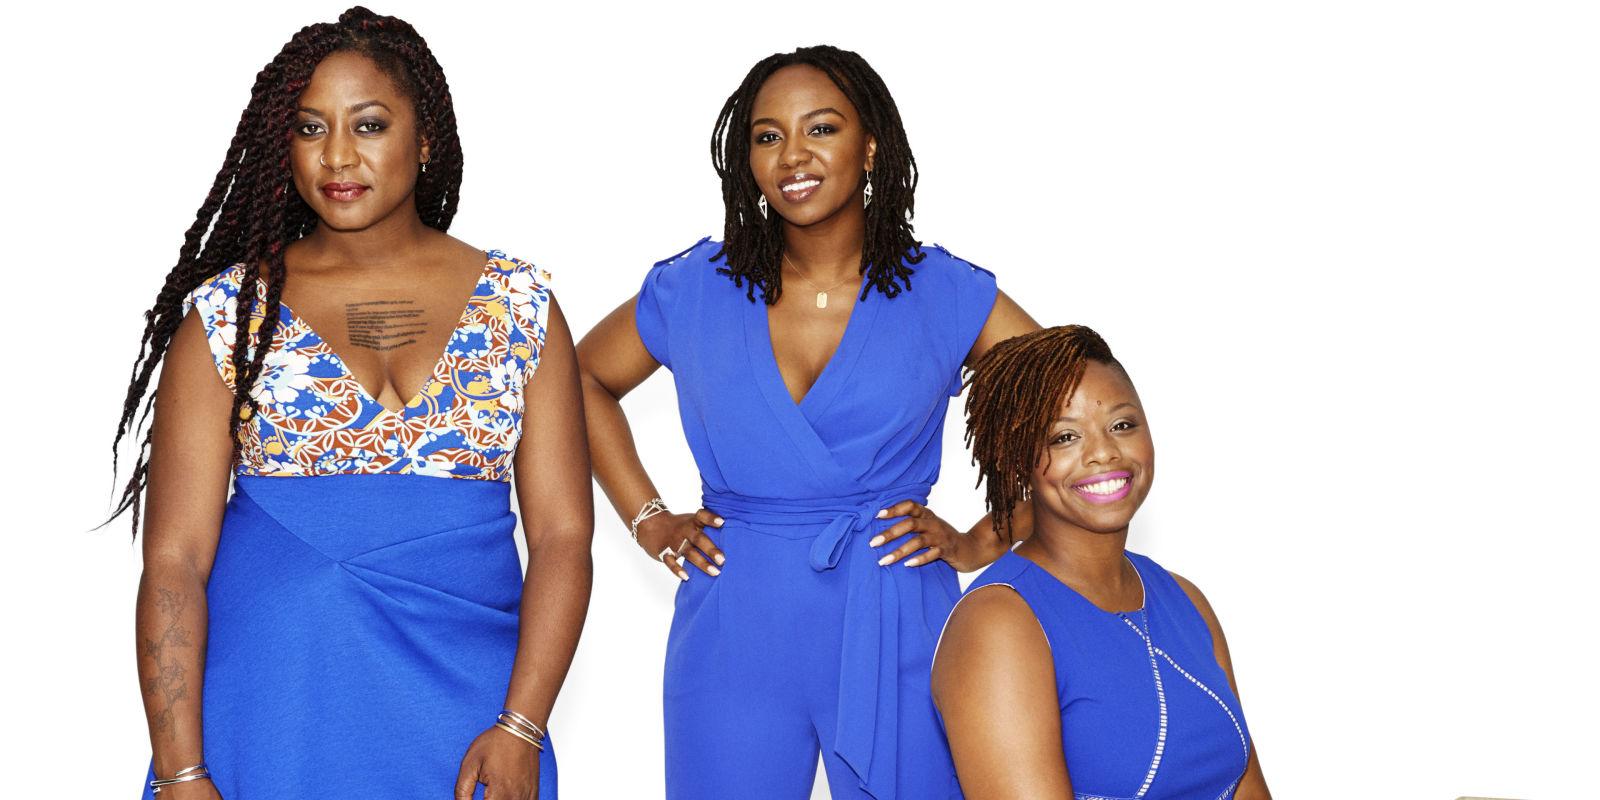 Meet The Women Who Created #BlackLivesMatter